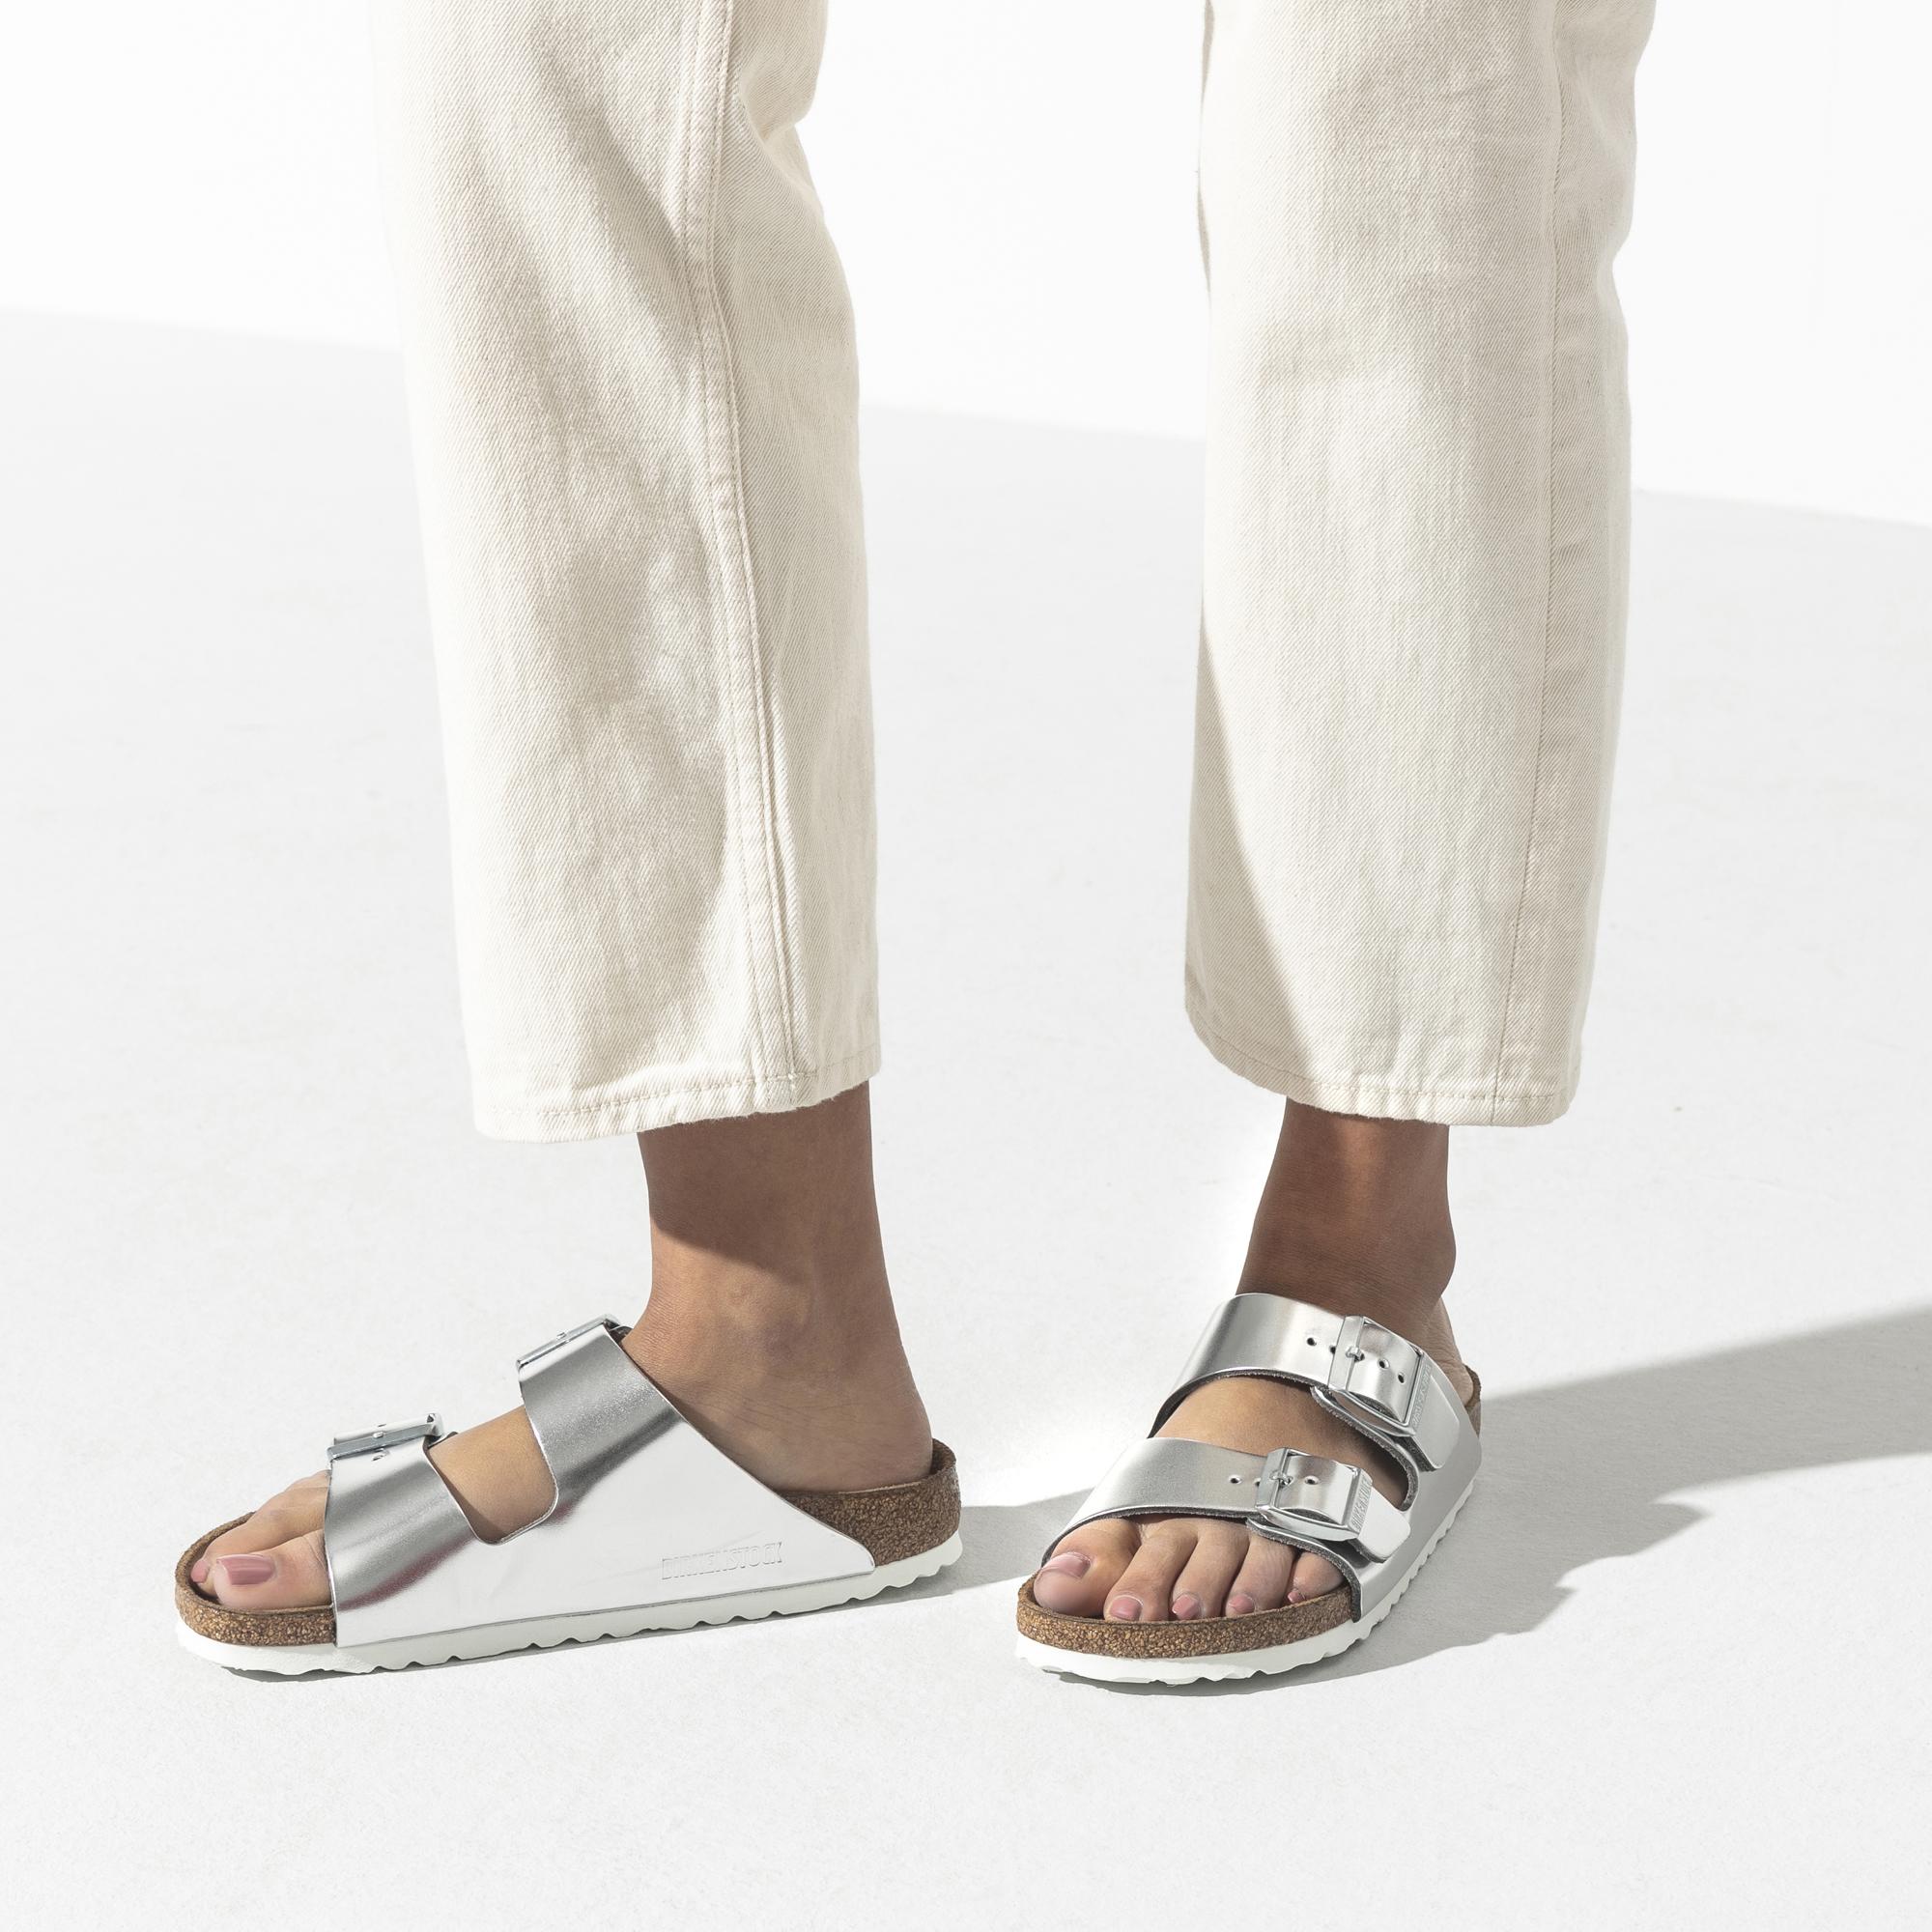 Birkenstock Arizona Soft Footbed Metallic Leather Sandal, Metallic SilverWhite